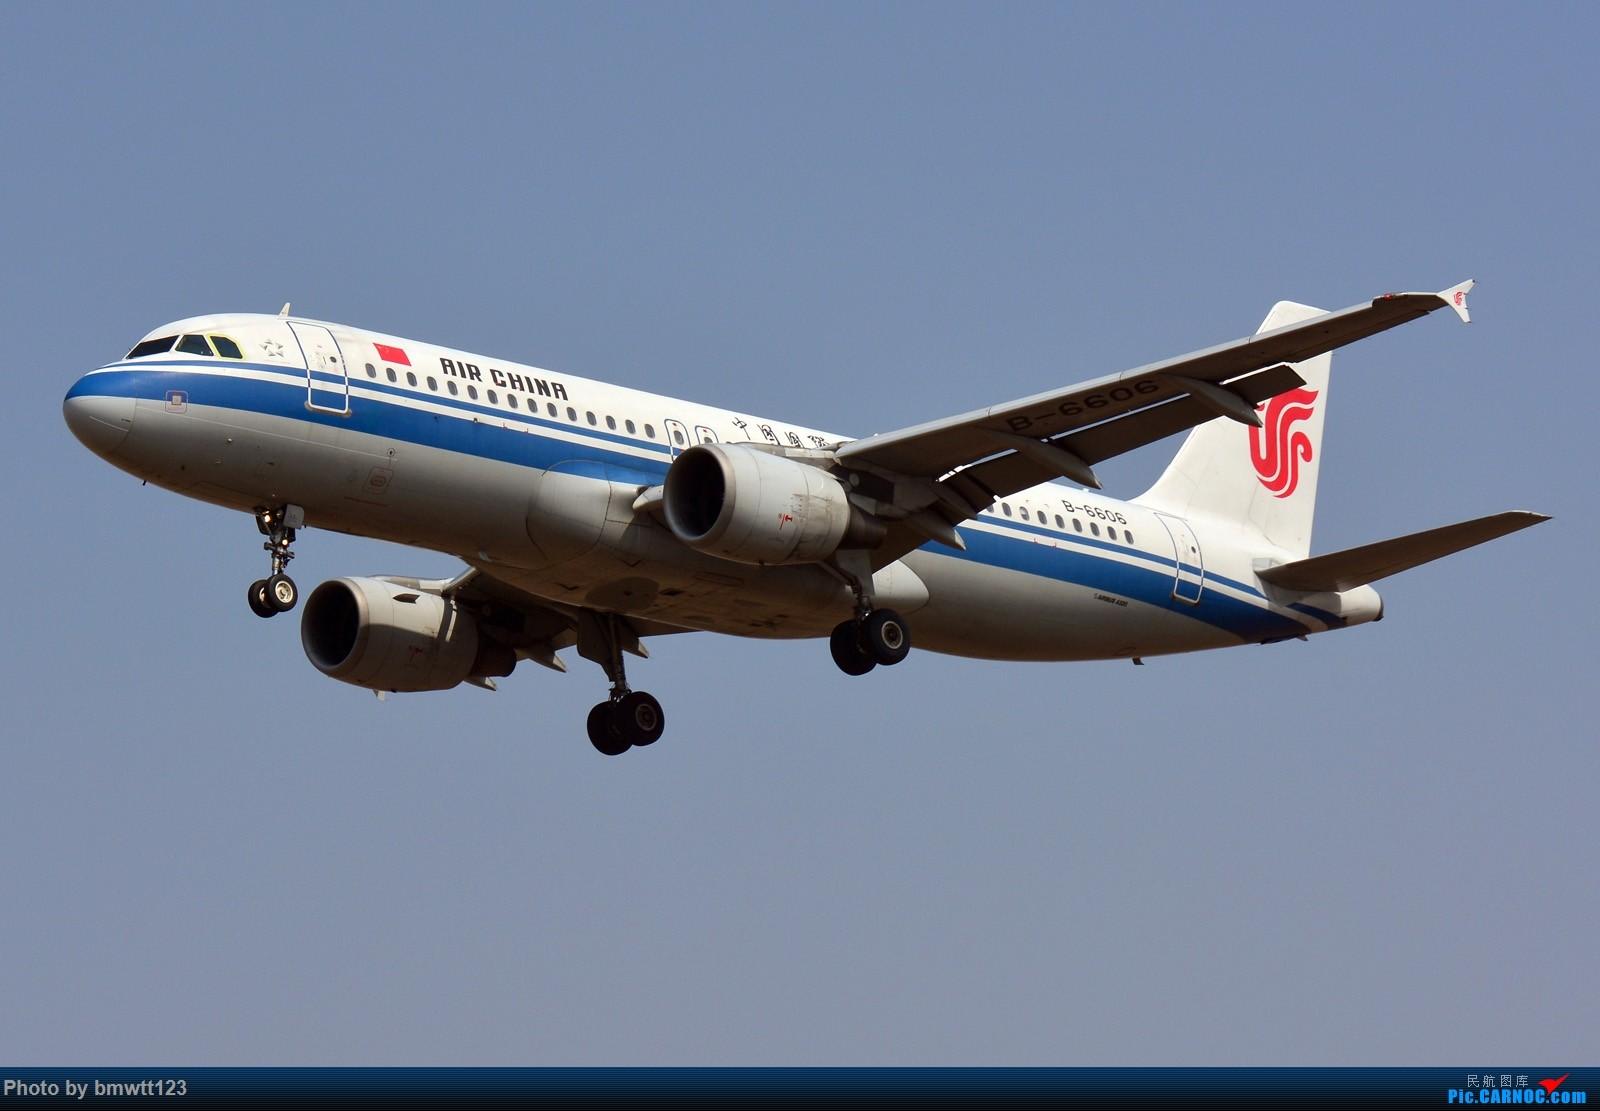 Re:【SHE沈阳】啃猪蹄,看飞机,悠哉!风太大,吃一嘴沙子,牙碜! AIRBUS A320-200 B-6606 中国沈阳桃仙国际机场